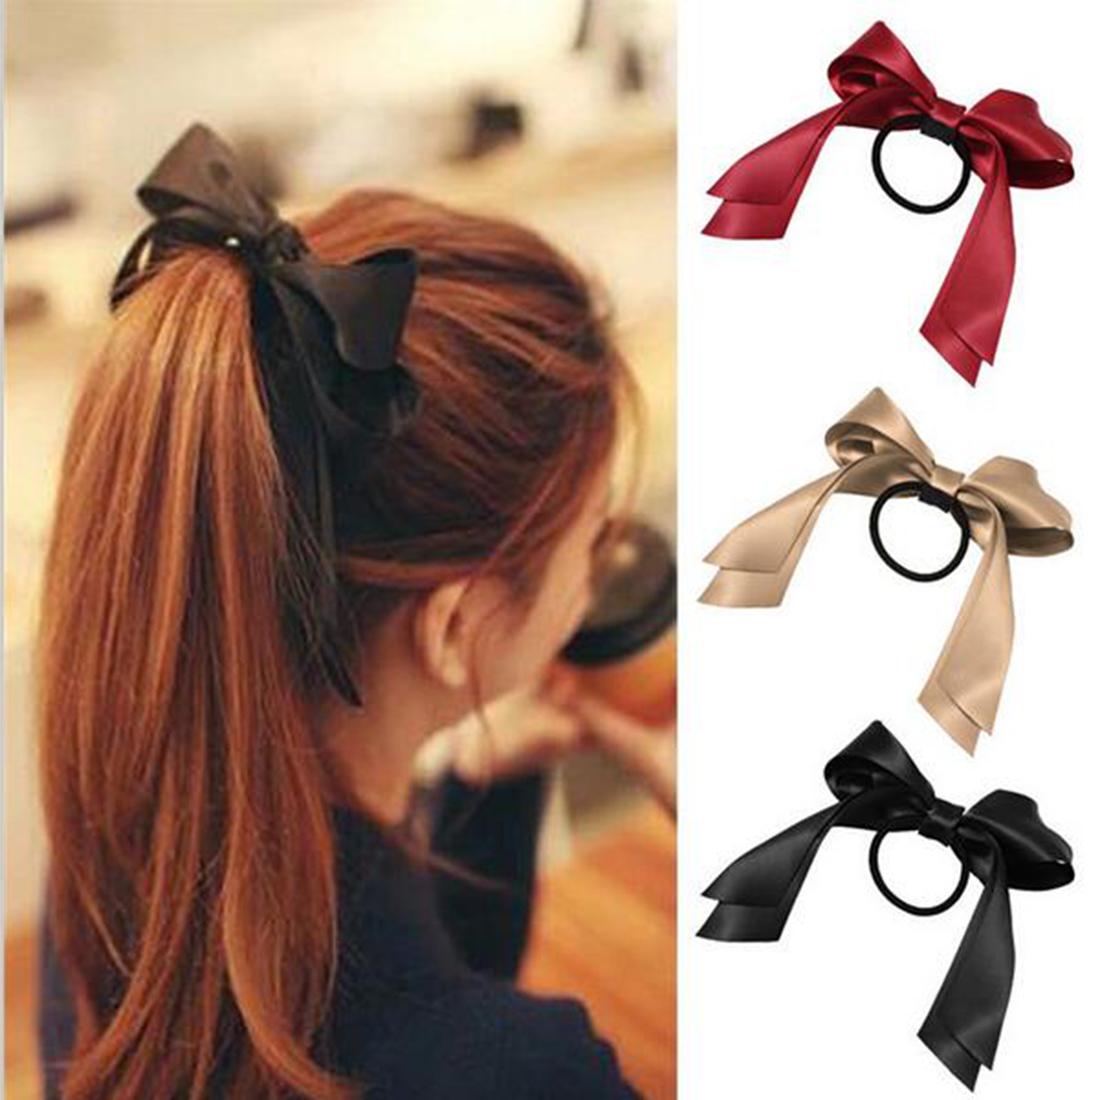 Women Tiara Satin Bow Tie Scrunch Hair Band Ribbon Scrunchie Ponytail Holder  Rope Rings Hair Accessories For Girl Pretty Hair Combs Pretty Hair Bands  From ... 40b06e7a88d